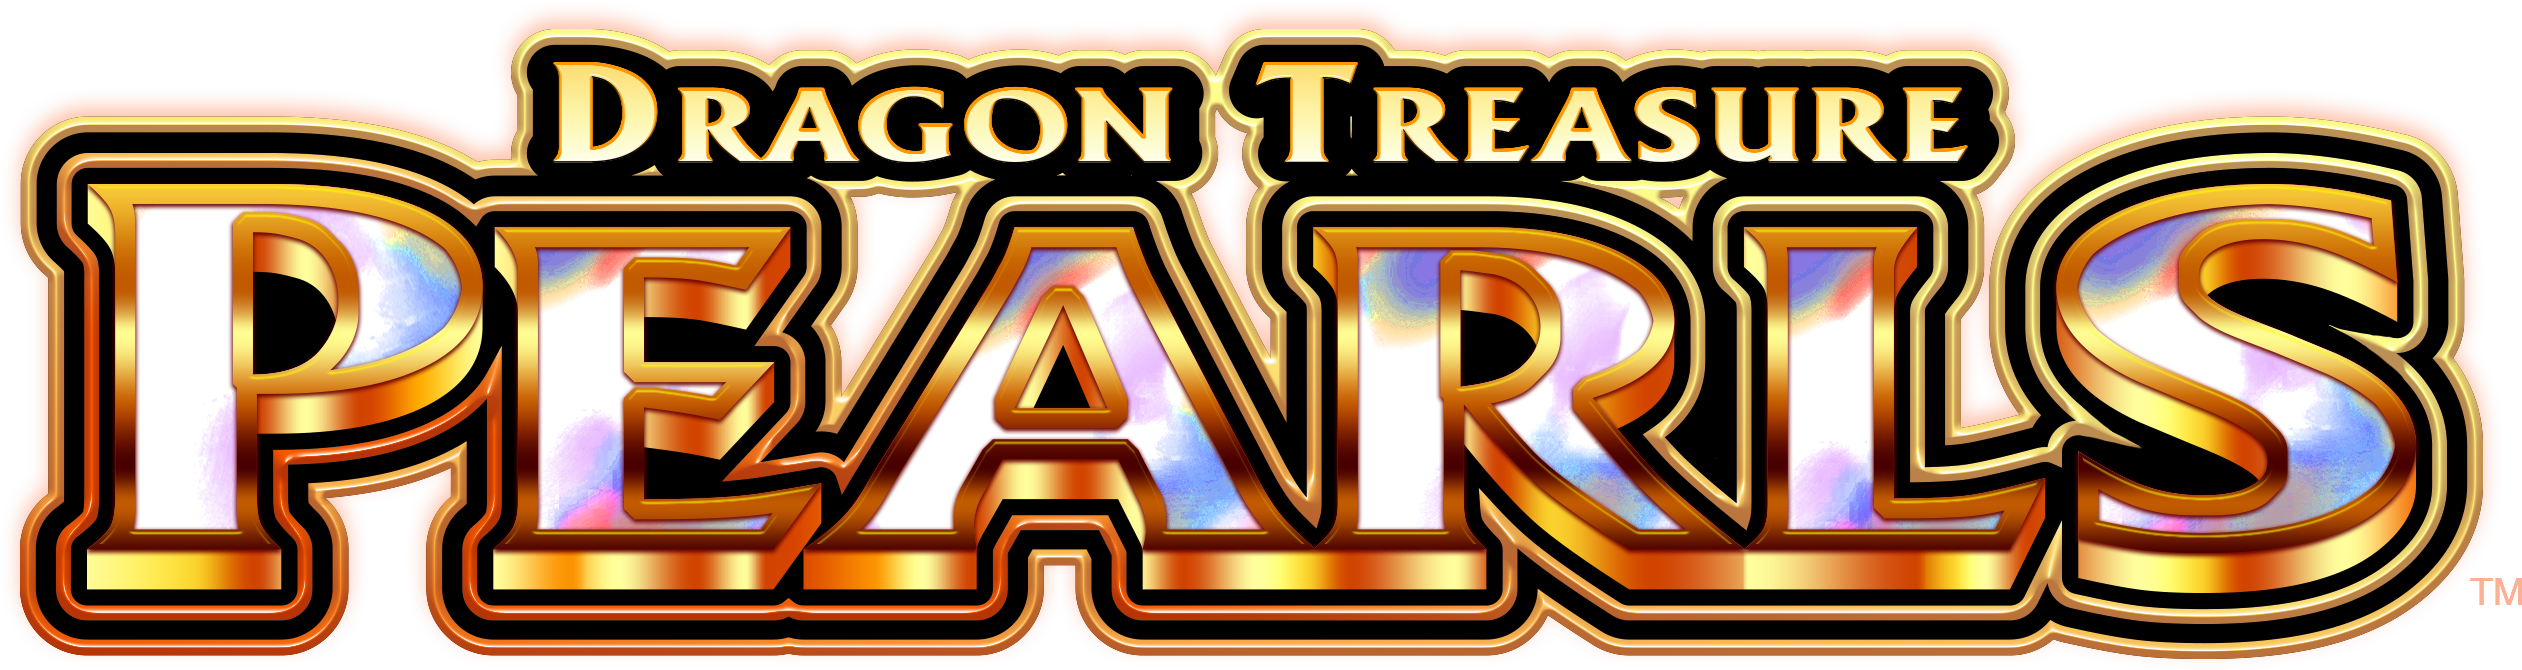 Dragon Treasure Pearls Logo